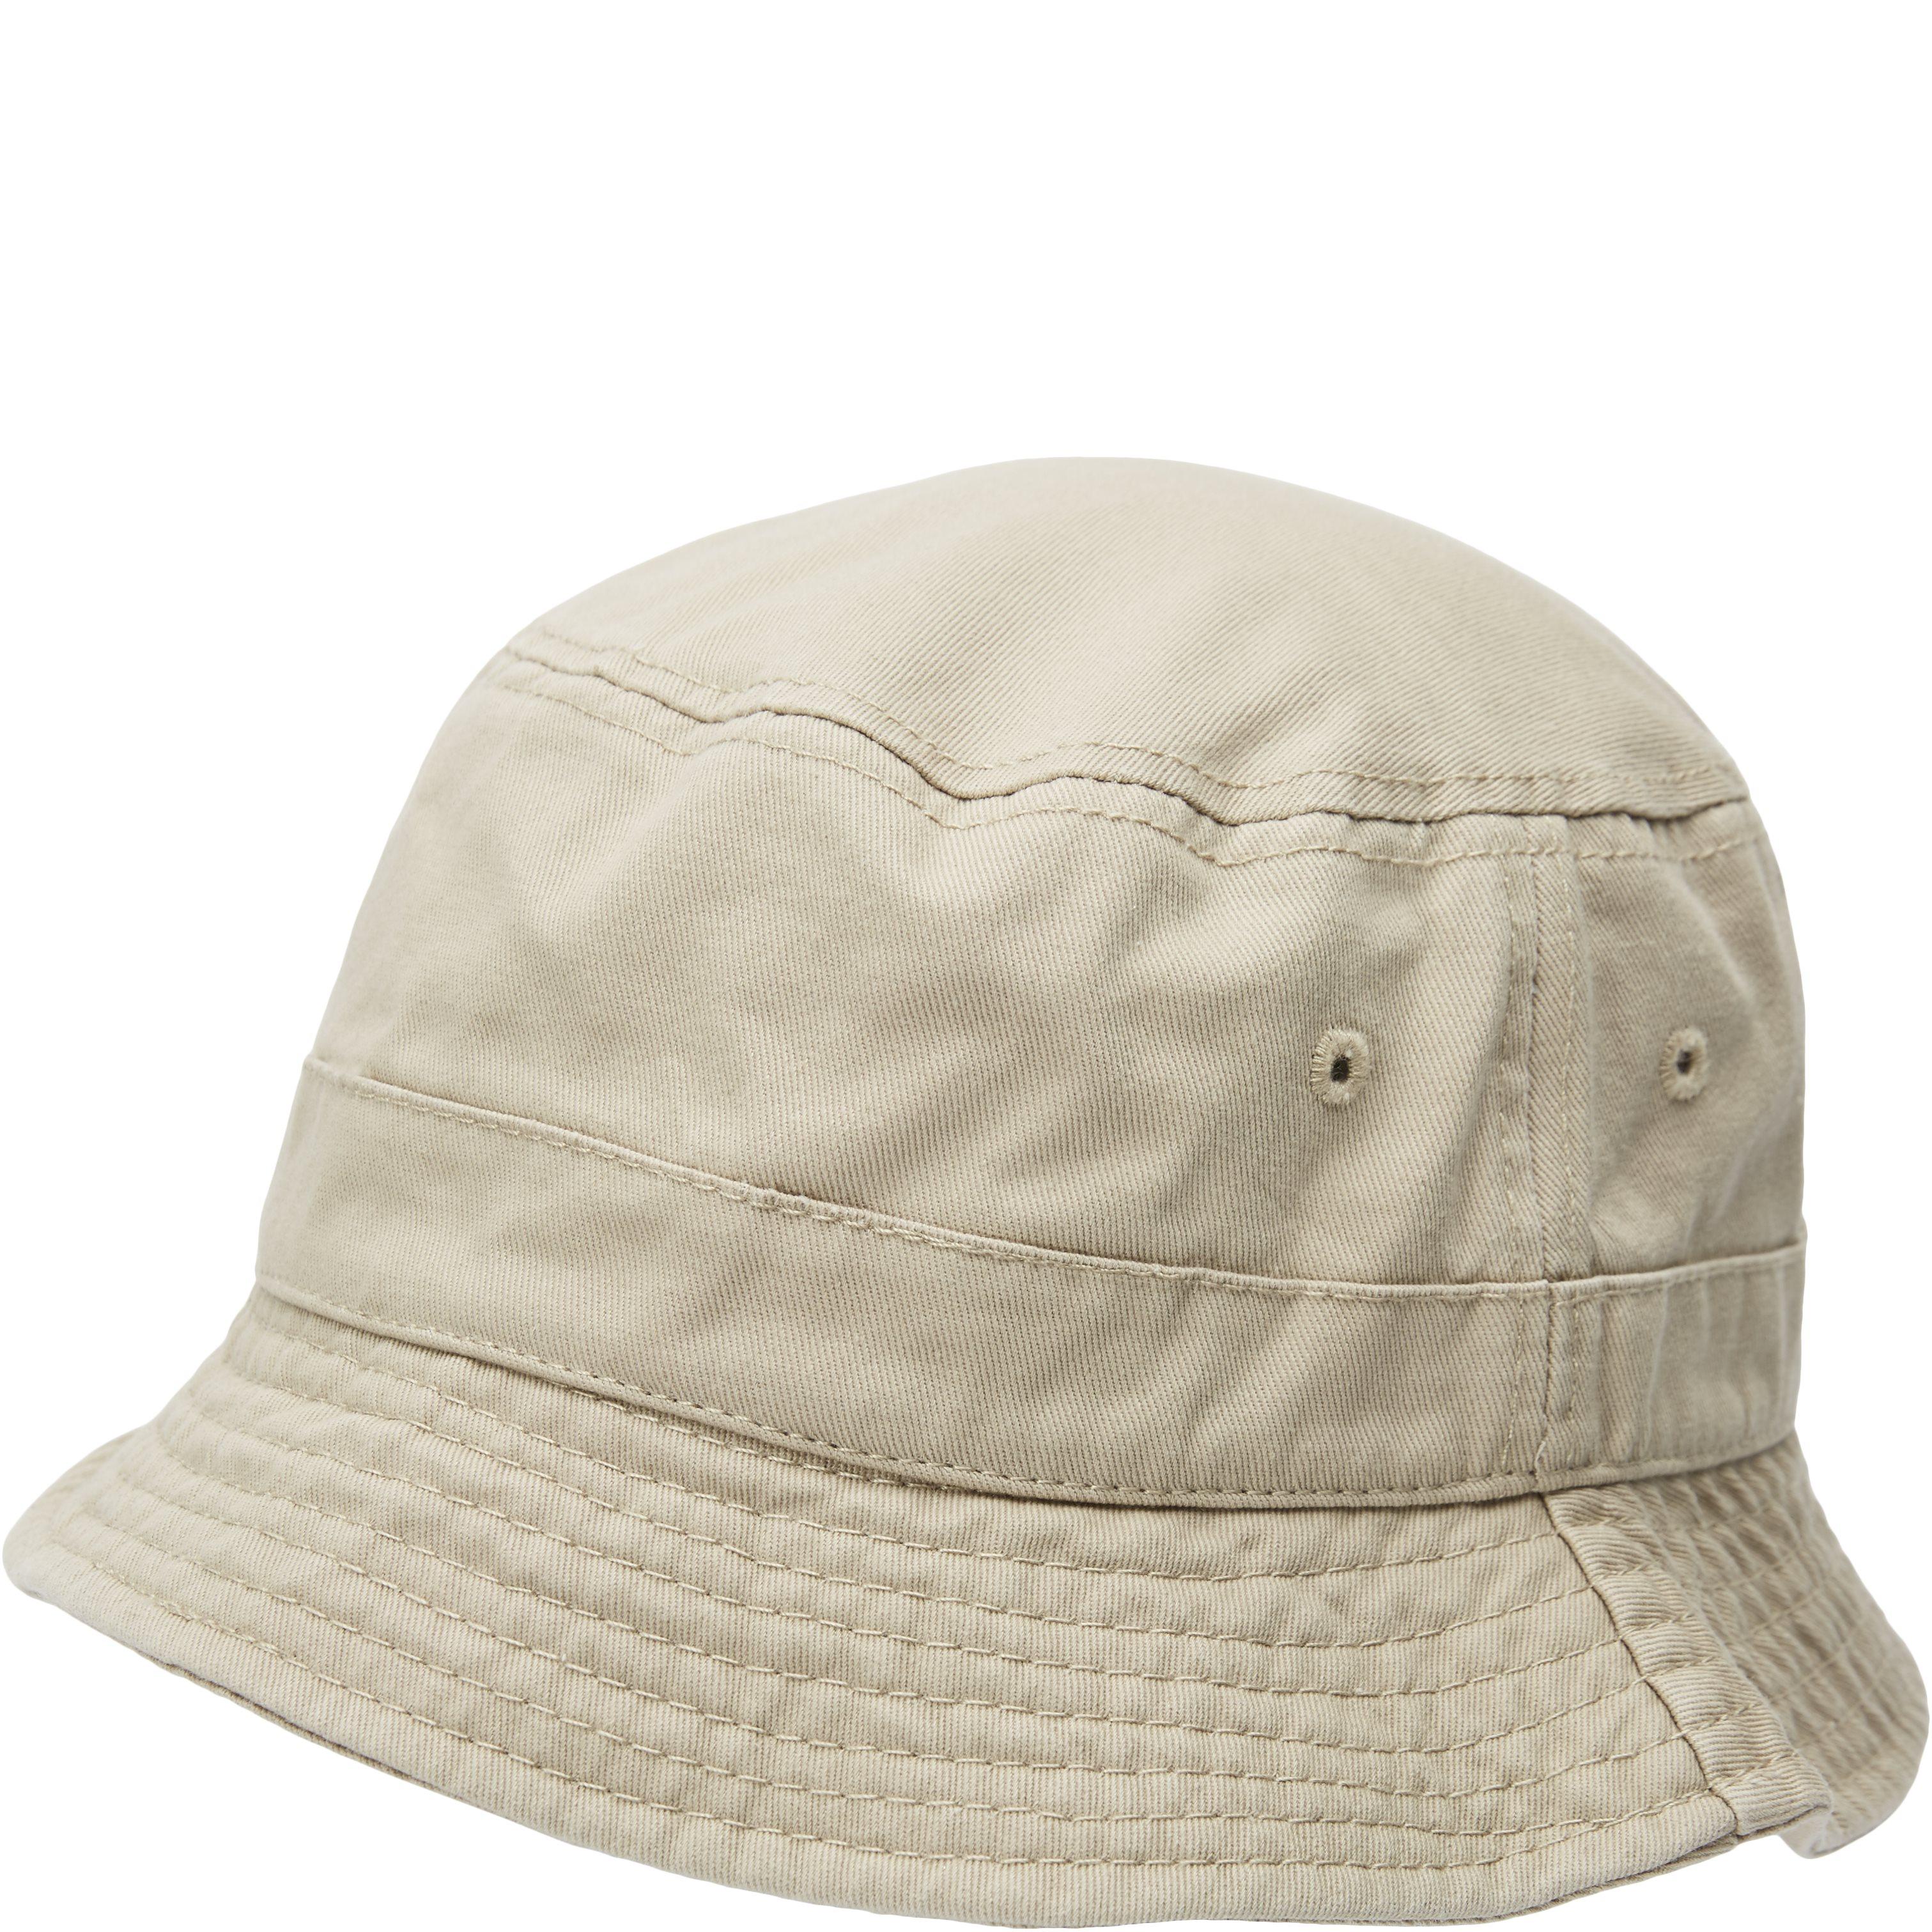 Atlantis Bucket Hat - Caps - Sand